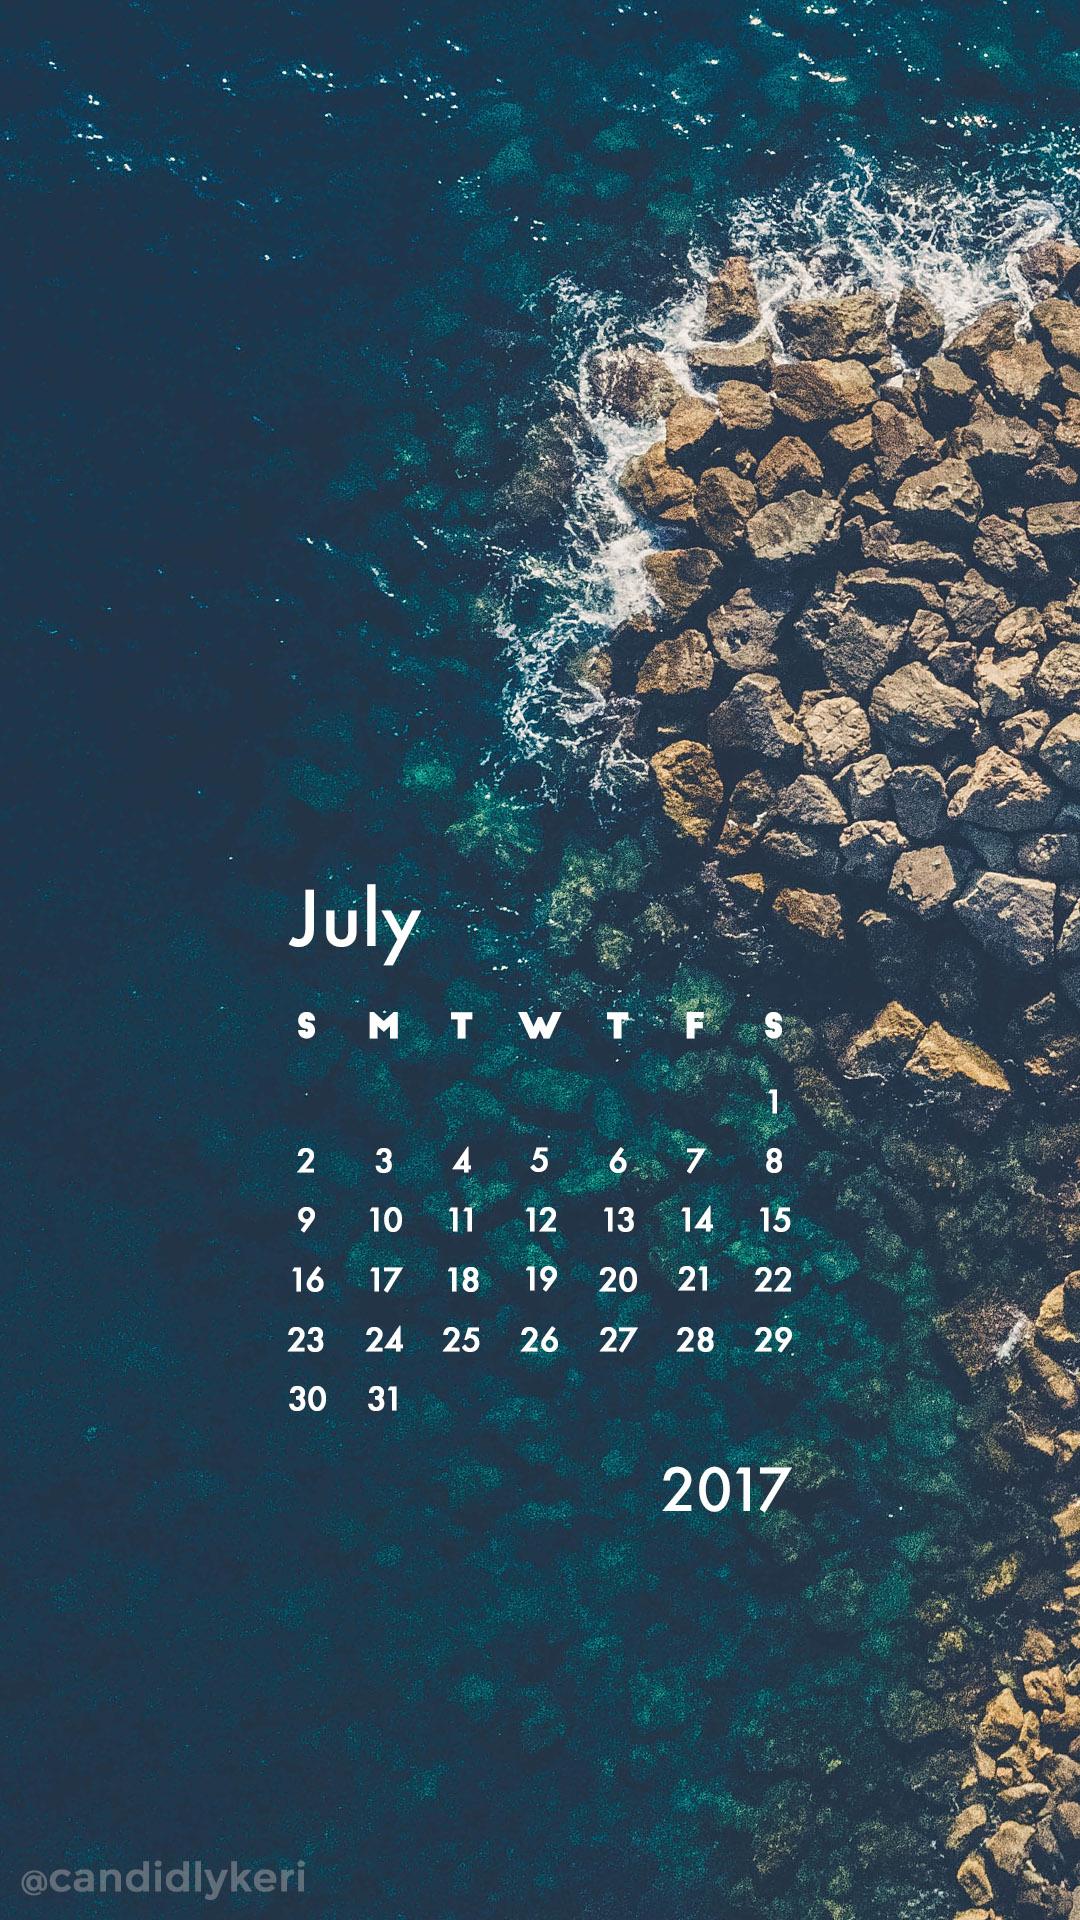 Ocean-waves-crashing-rocks-summer-July-calendar-you-can-download-for-free-on-the-blog-wallpaper-wp3808827